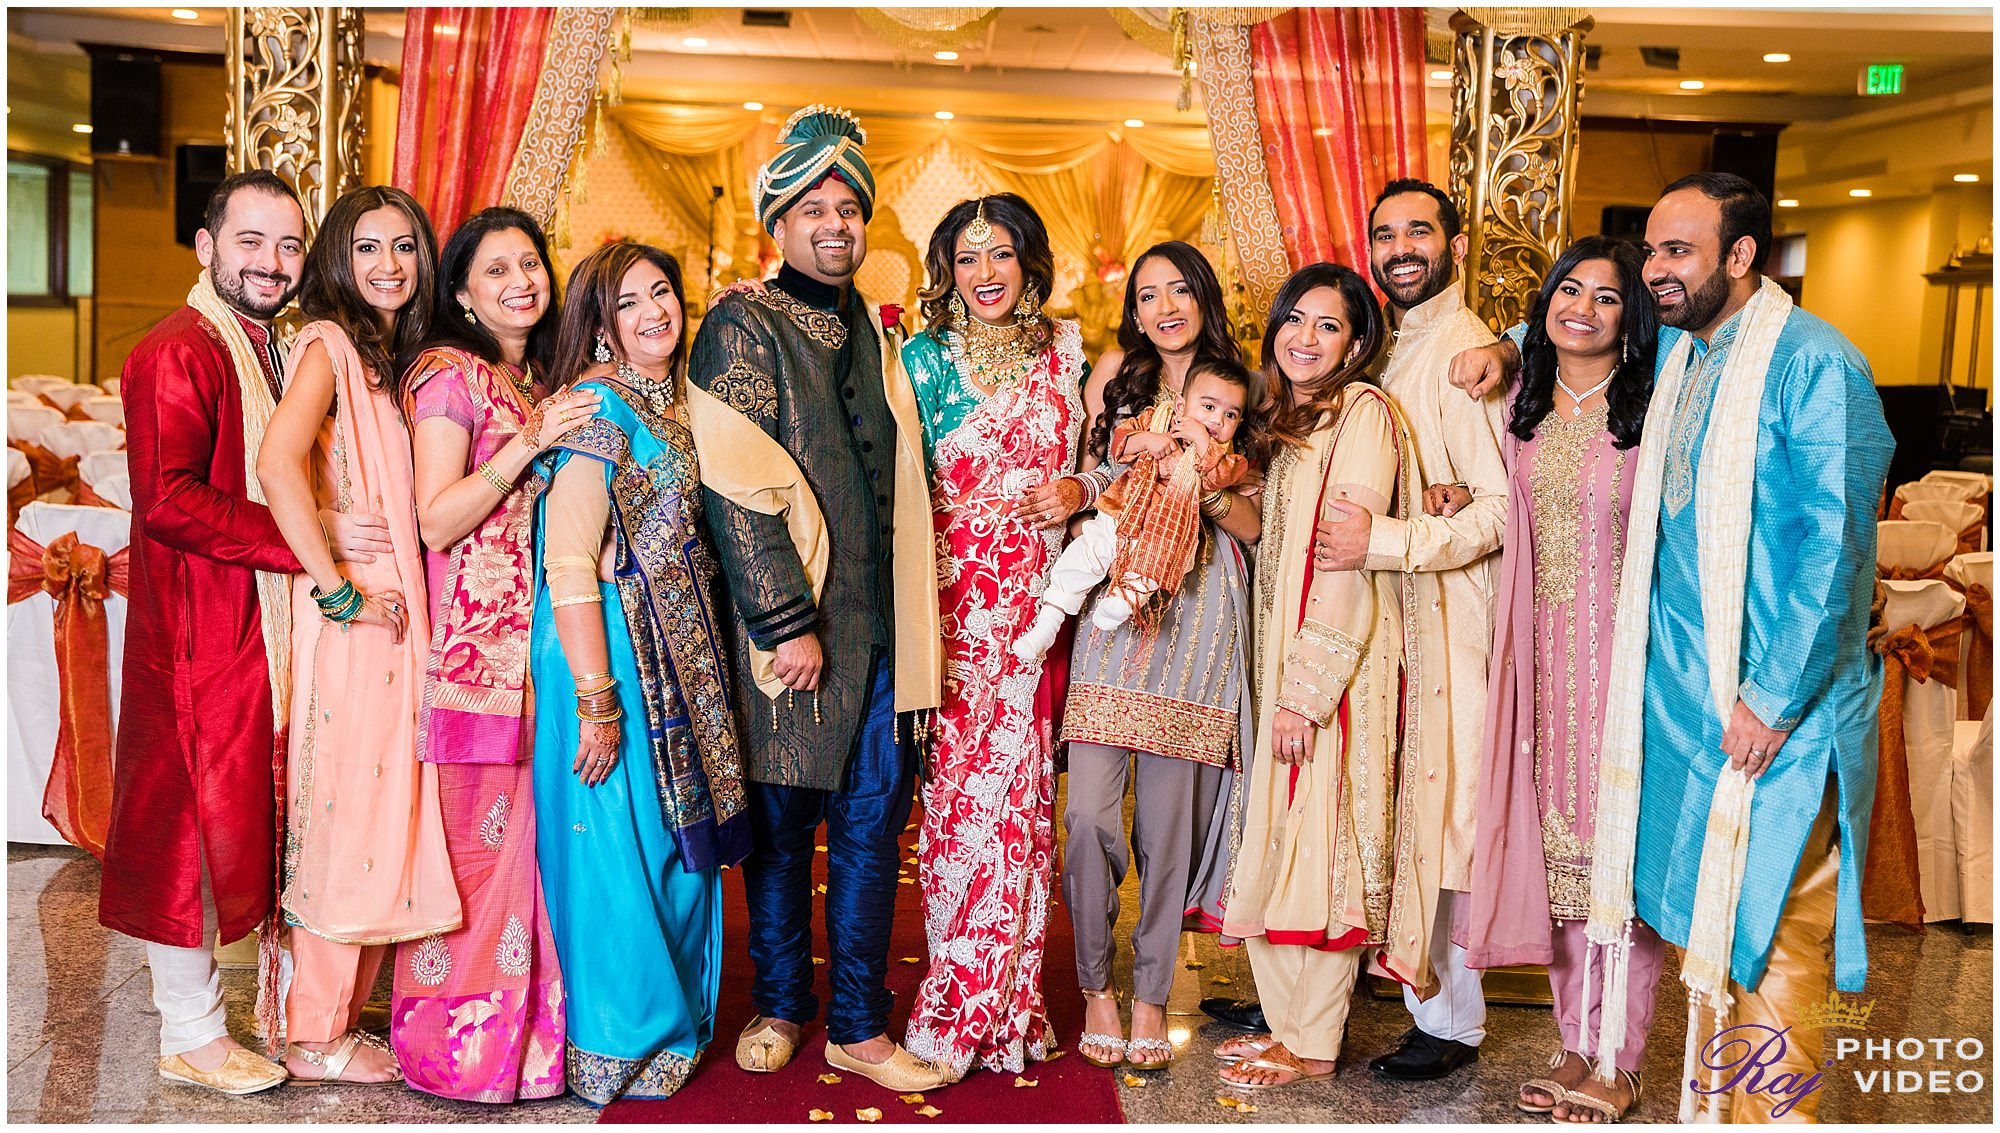 Sri-Guruvaayoorappan-Temple-Marlboro-NJ-Indian-Wedding-Chiyomi-Scott-00012.jpg